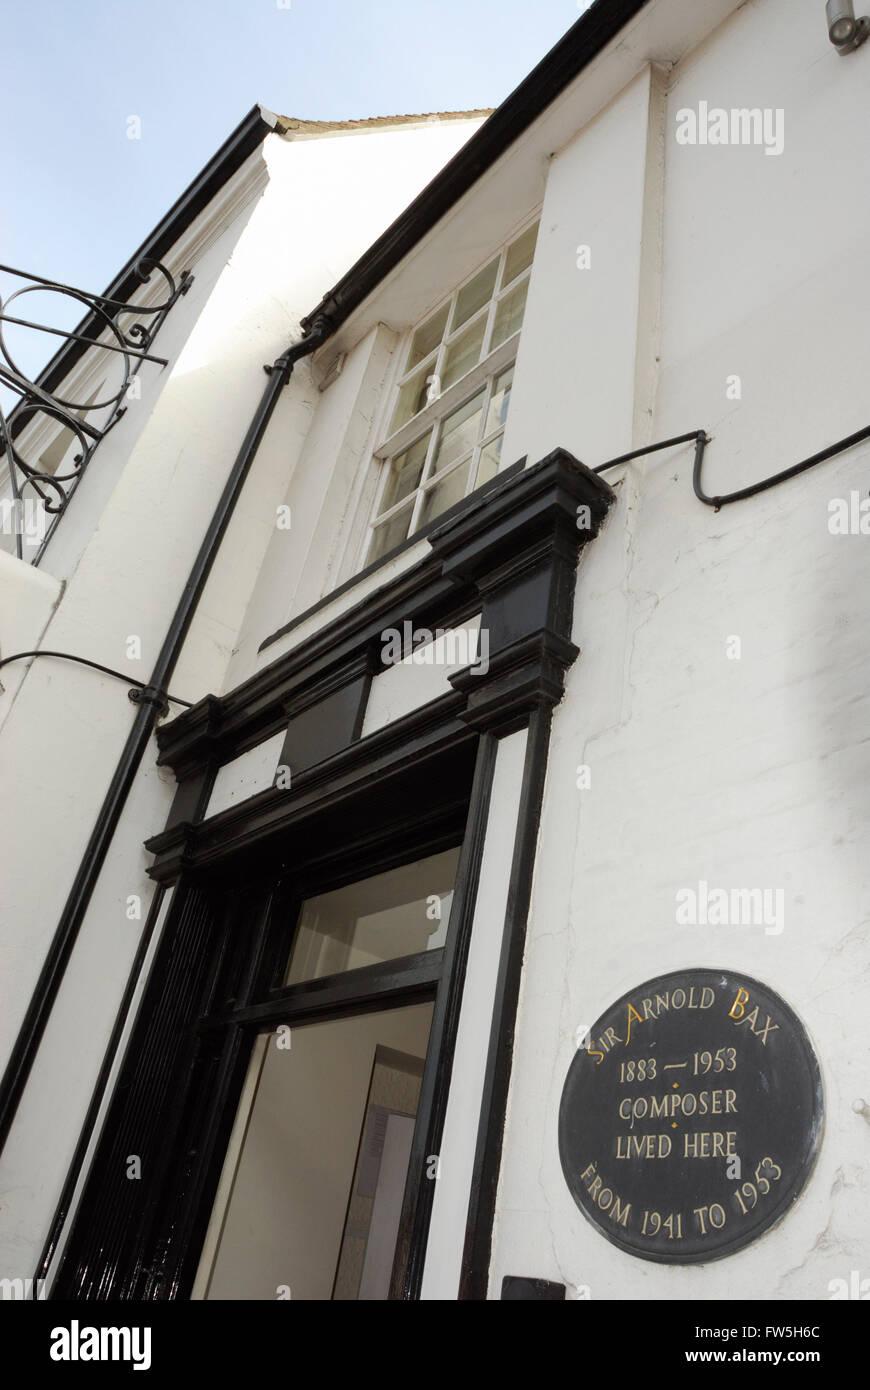 White Horse Hotel, Storrington, Sussex, Heimat des Komponisten Arnold Bax, aus 1941-1953 Stockbild